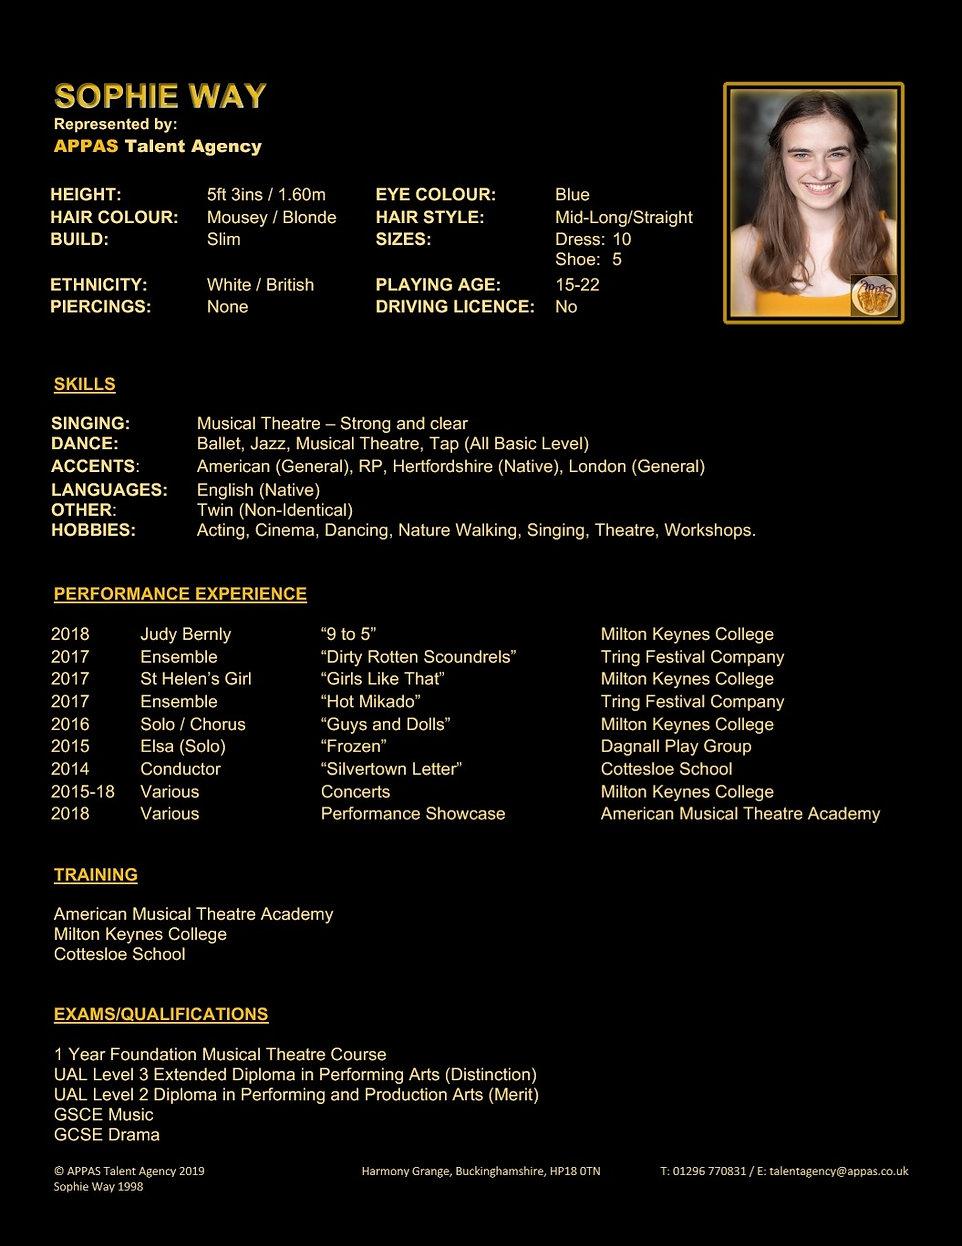 SOPHIE WAY WEB CV (JULY 2019) 1.jpg